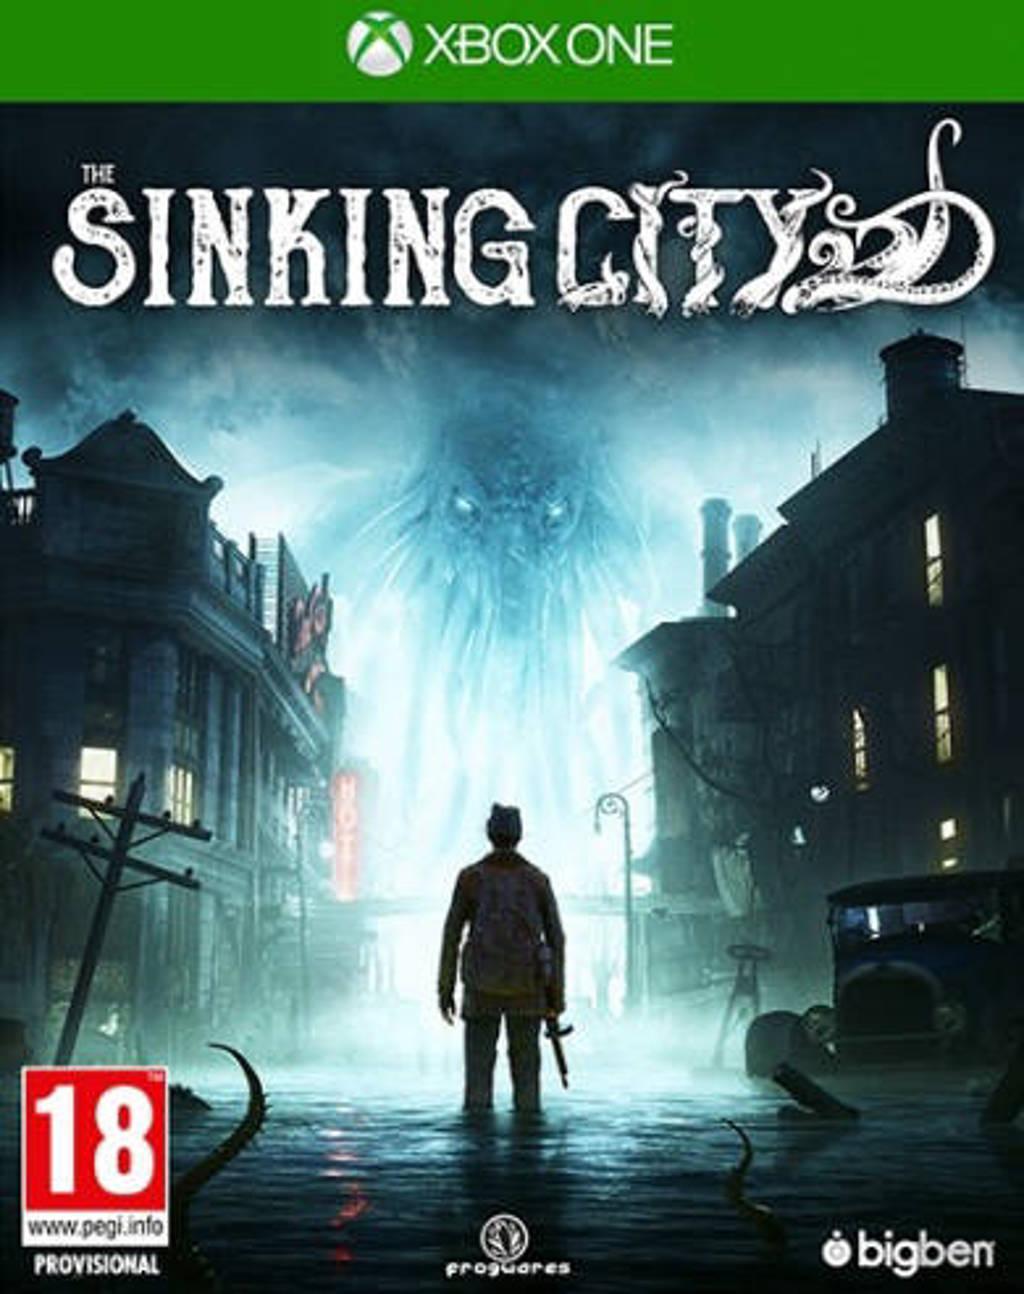 Sinking city (Xbox One)